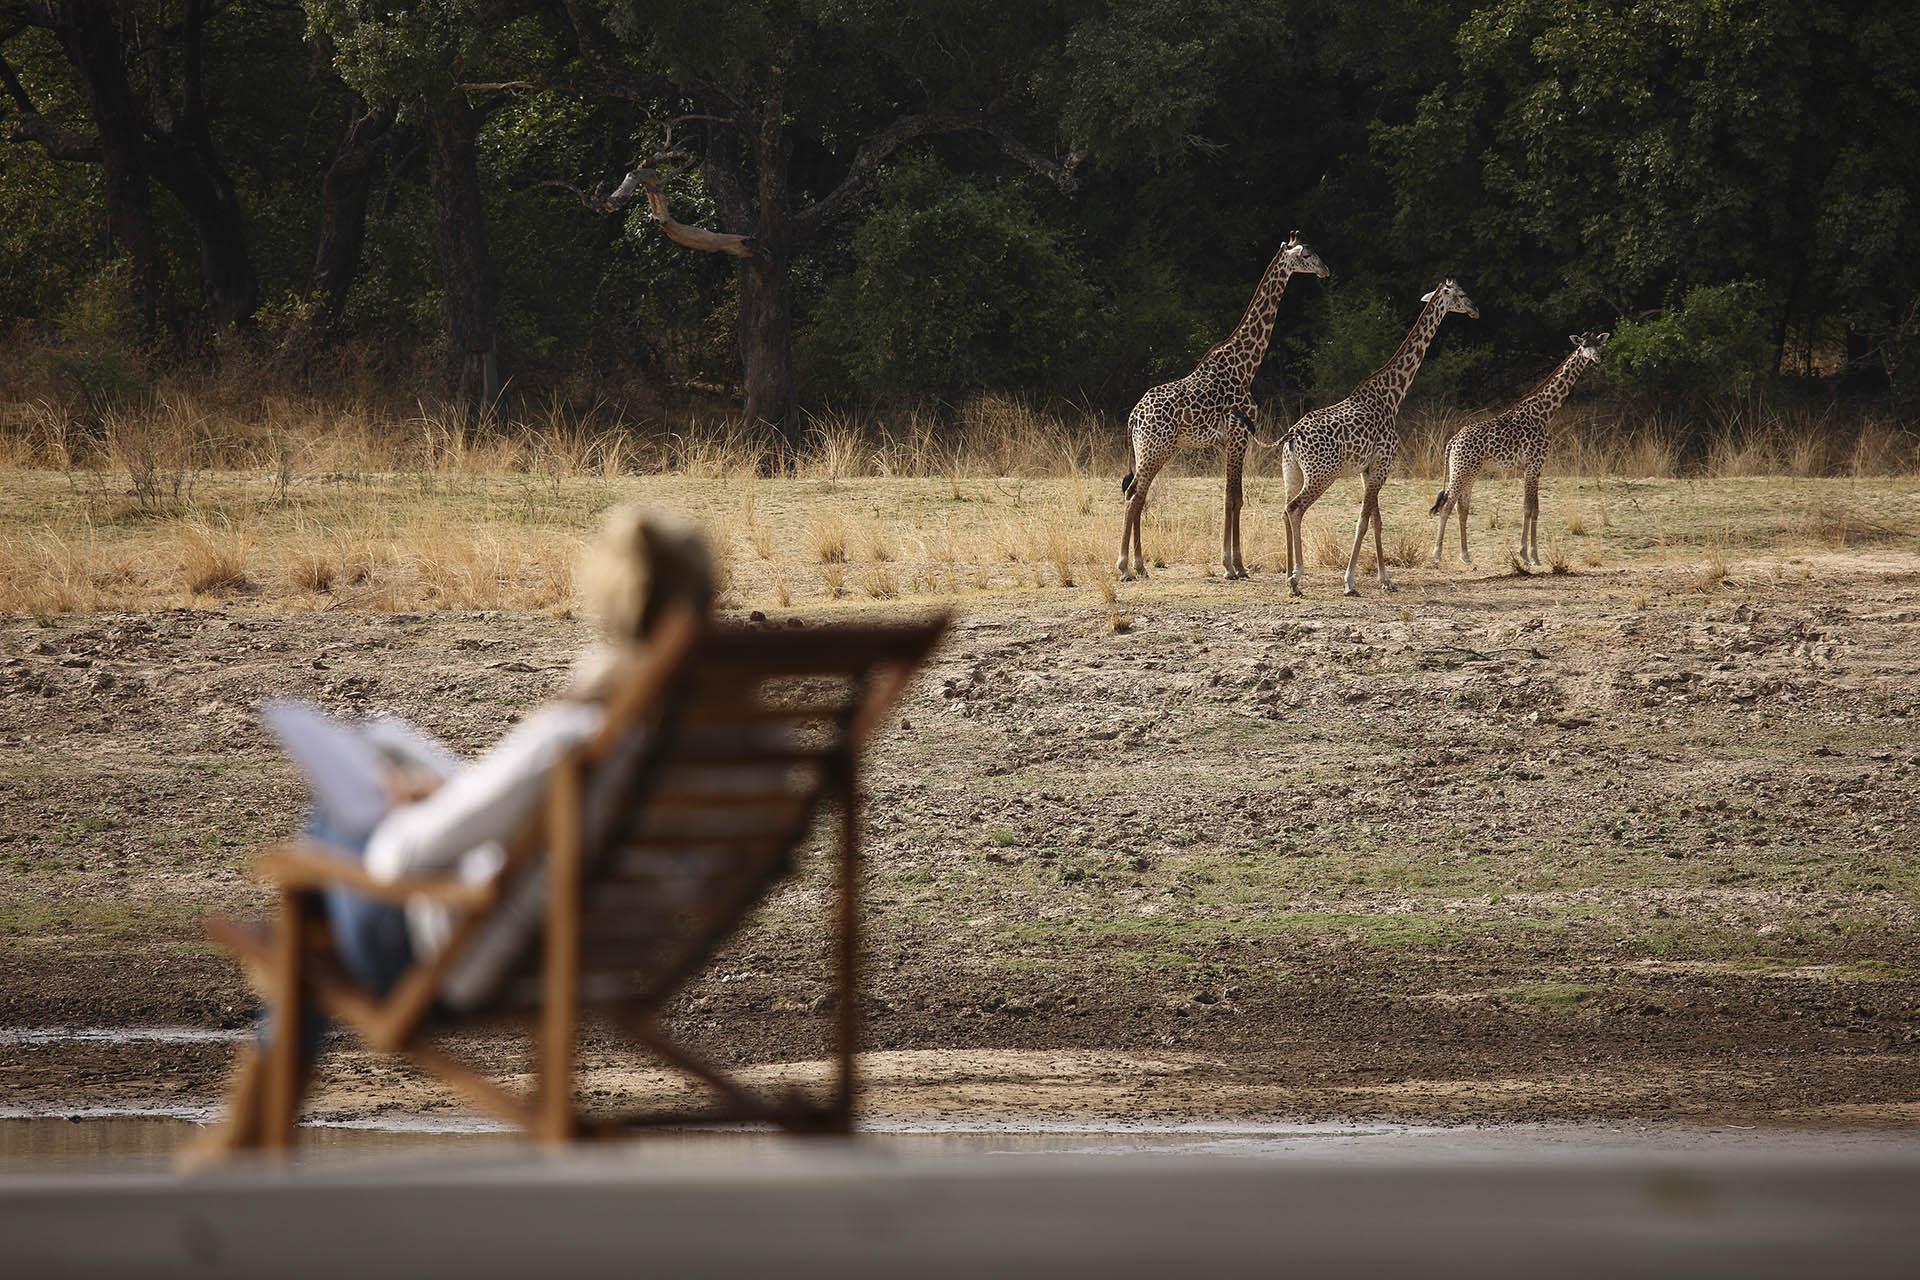 malawi zambia northern-explorer-15-nights-bush-beach-safaris-tours-malawi-adventures-experiences-holidays-specialist-tour-operator-chinzombo-giraffe